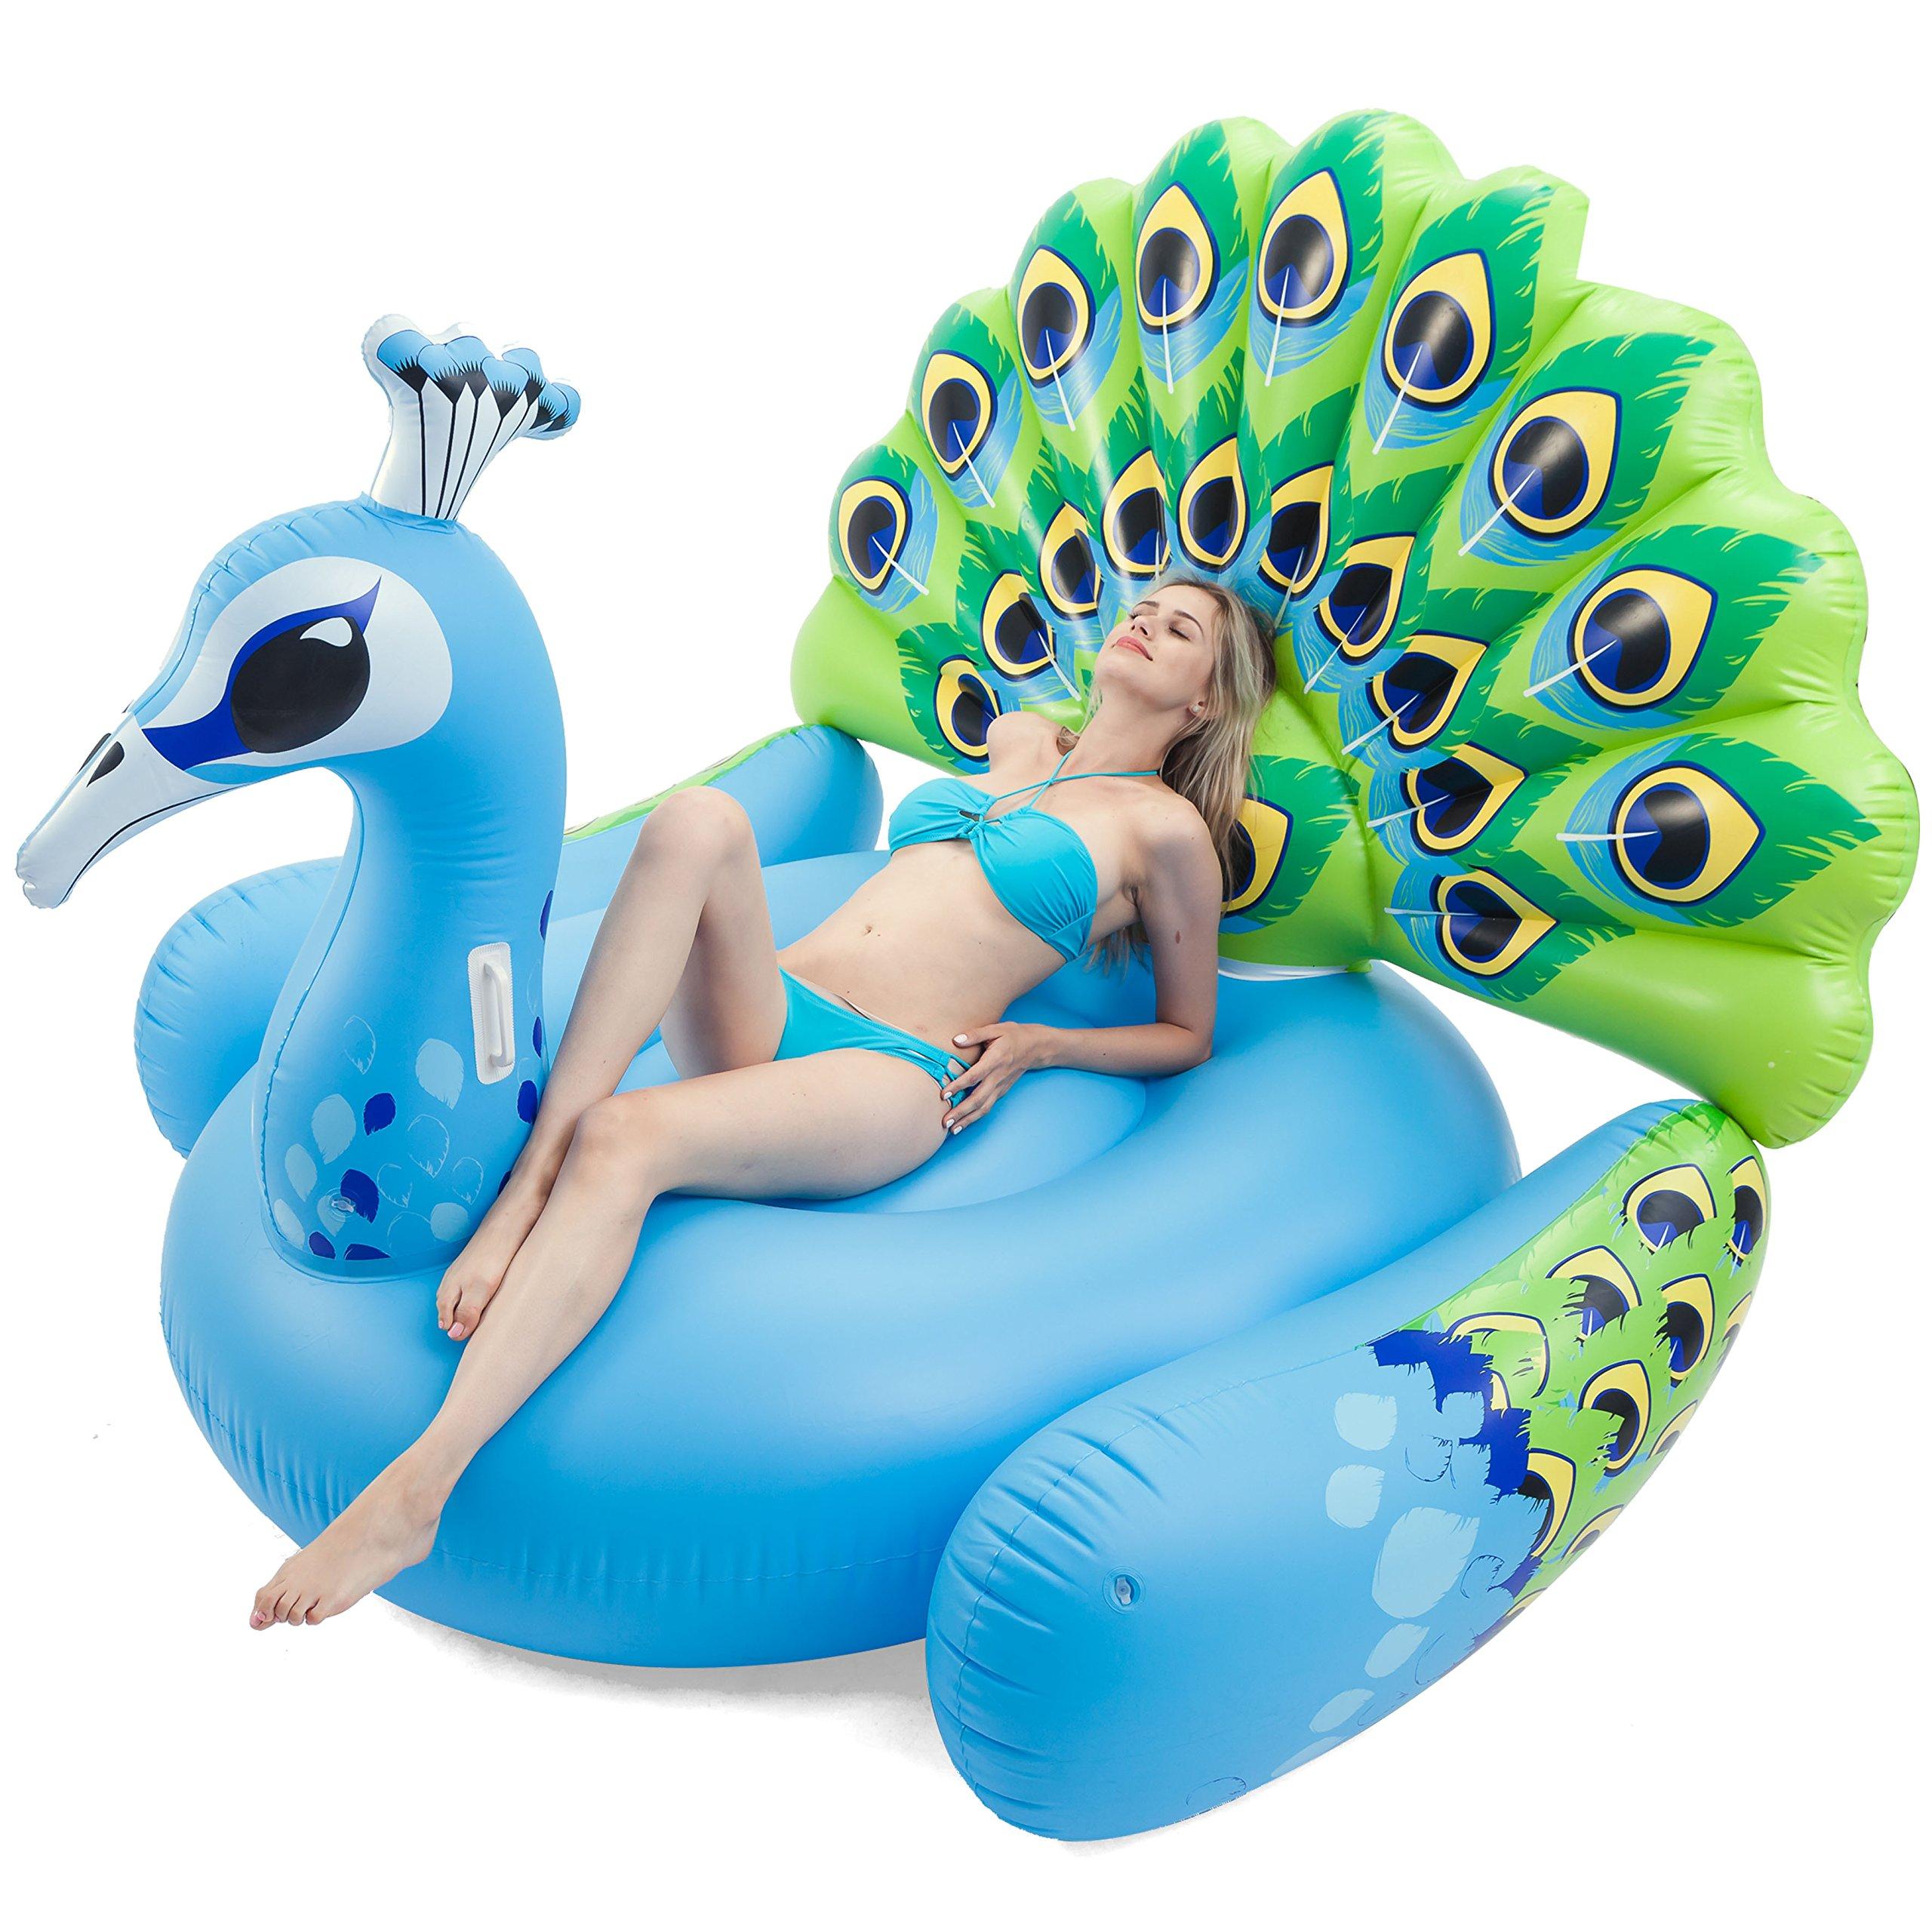 JOYIN Giant Inflatable Peacock Pool Float, Fun Beach Floaties, Swim Party Toys, Pool Island, Summer Pool Raft Lounge for Adults & Kids by by JOYIN